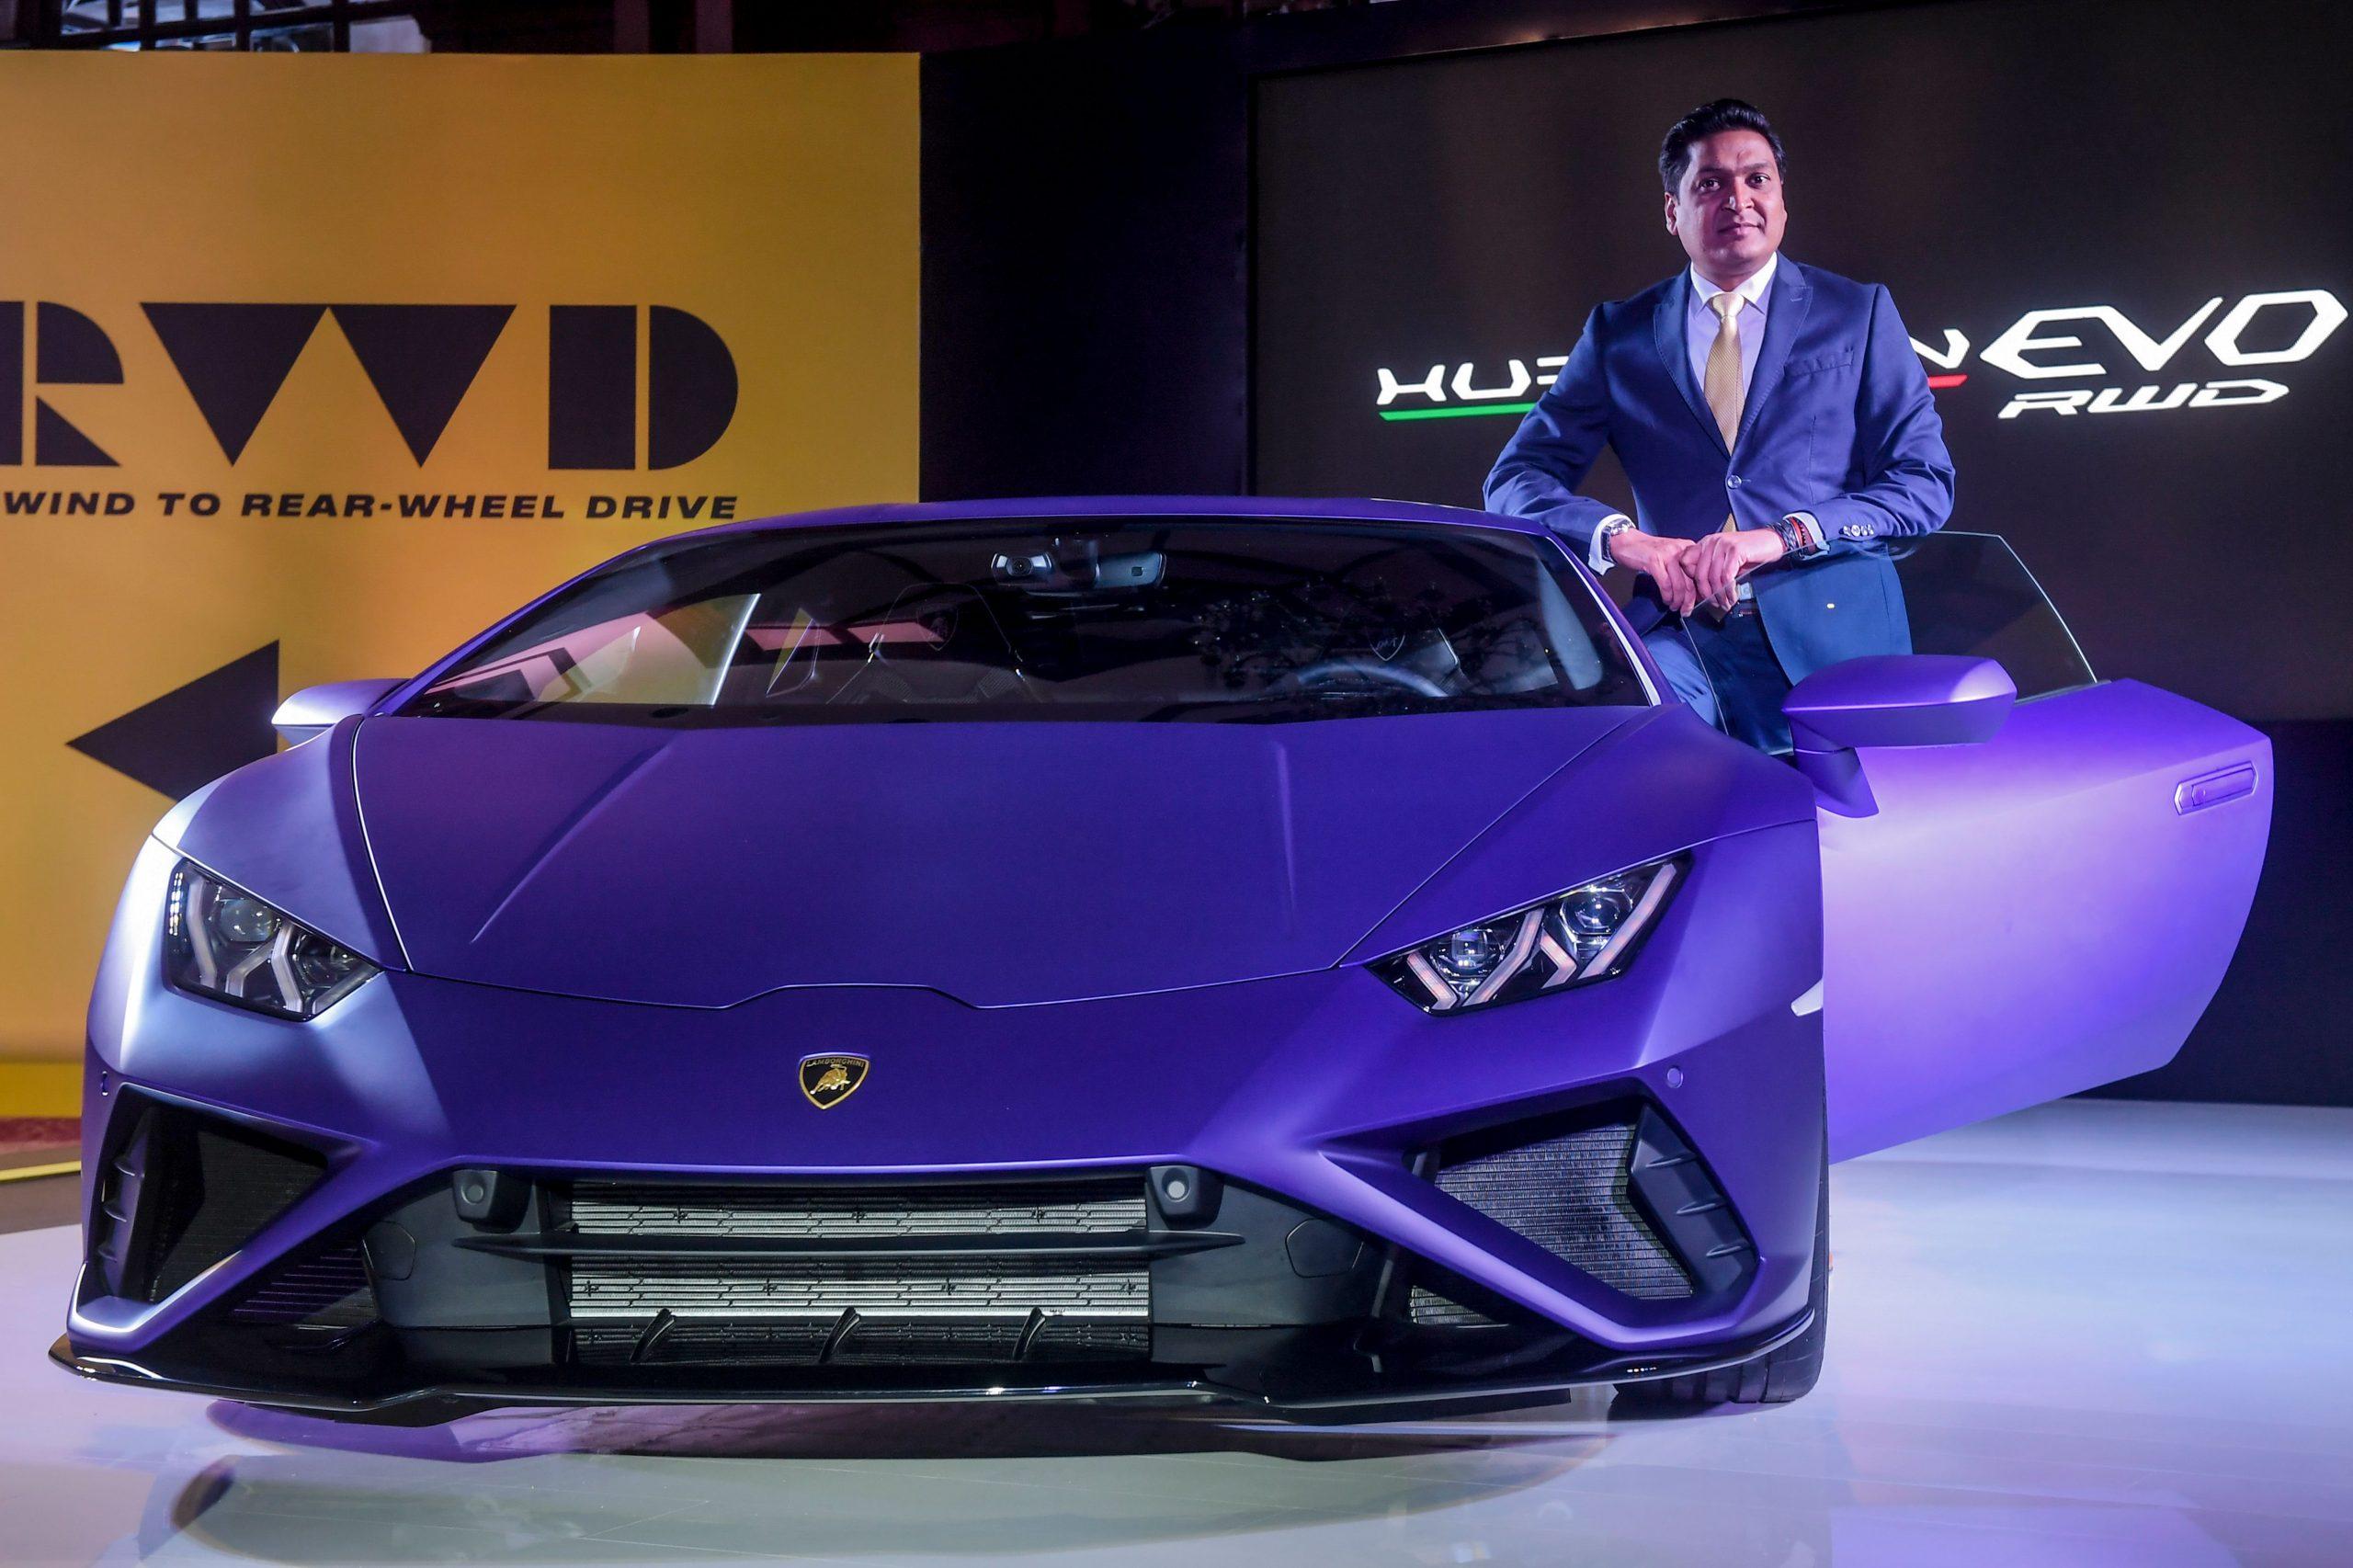 Head of Lamborghini India Sharad Agarwal poses next to the new Lamborghini Huracan EVO Rear-Wheel Drive (RWD) car during a show in Kolkata on February 2, 2020. (Photo by Dibyangshu SARKAR / AFP)